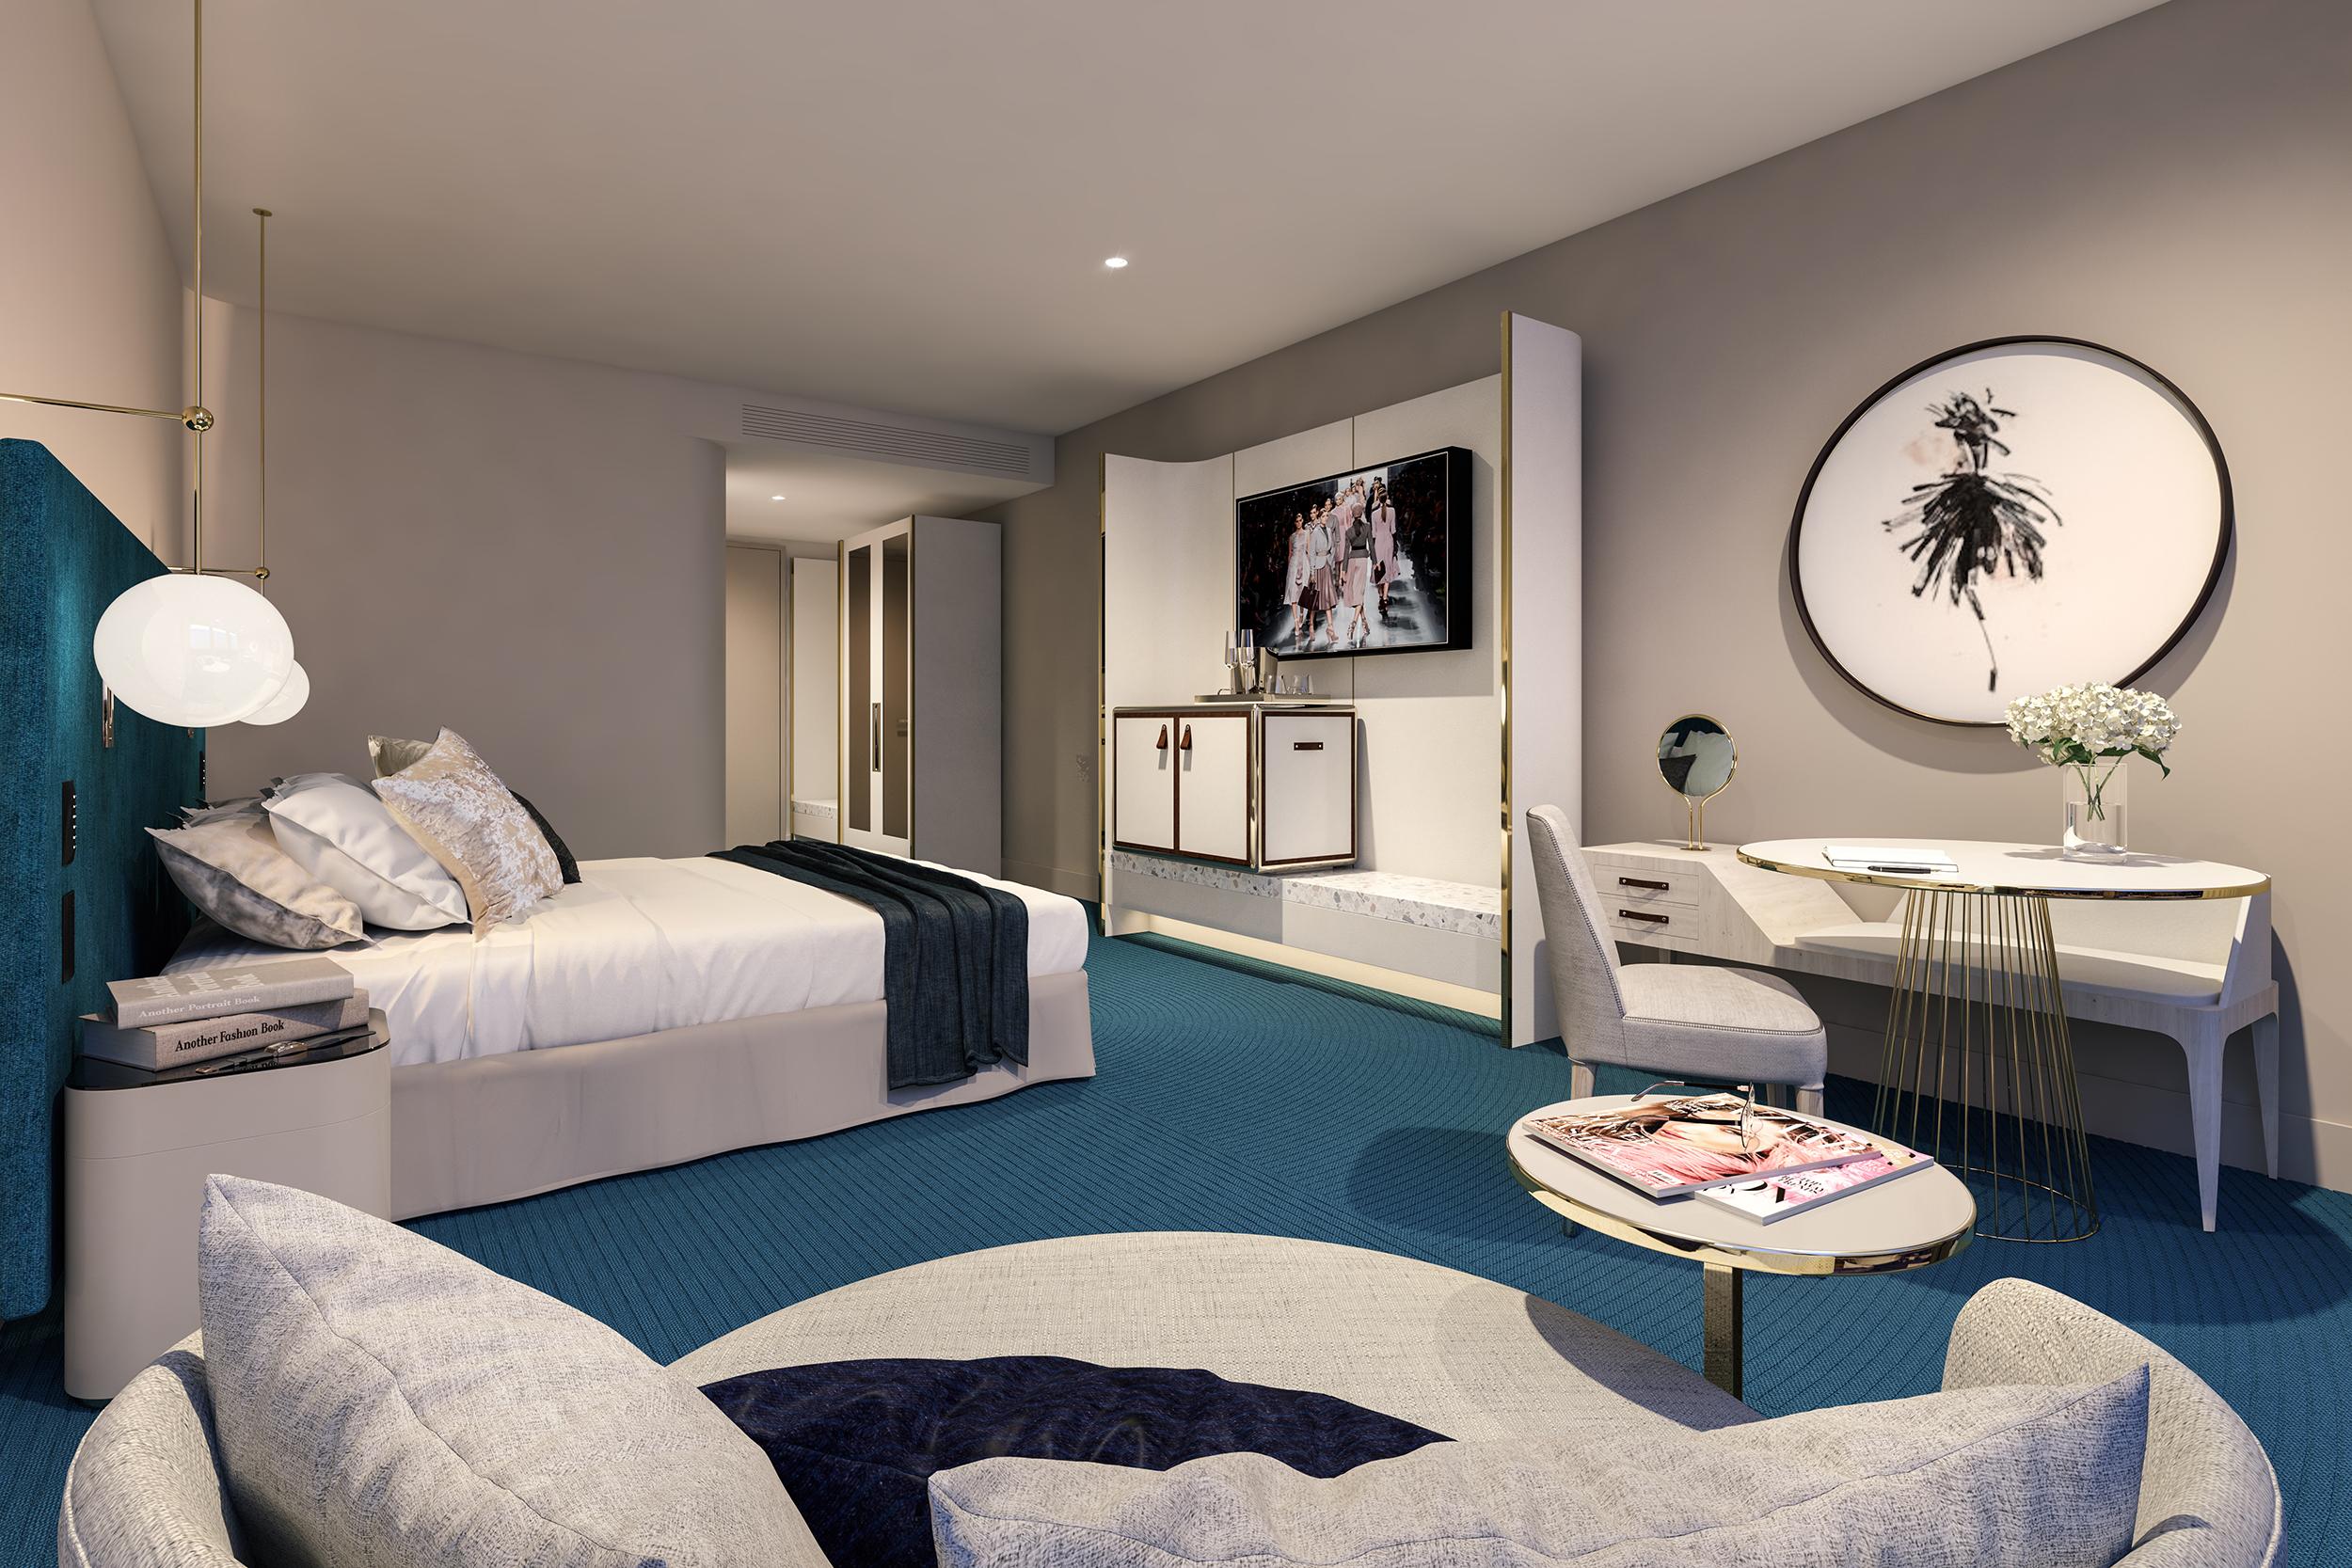 Chadstone Hotel - King Room - Classic In MR - Update 03.jpg